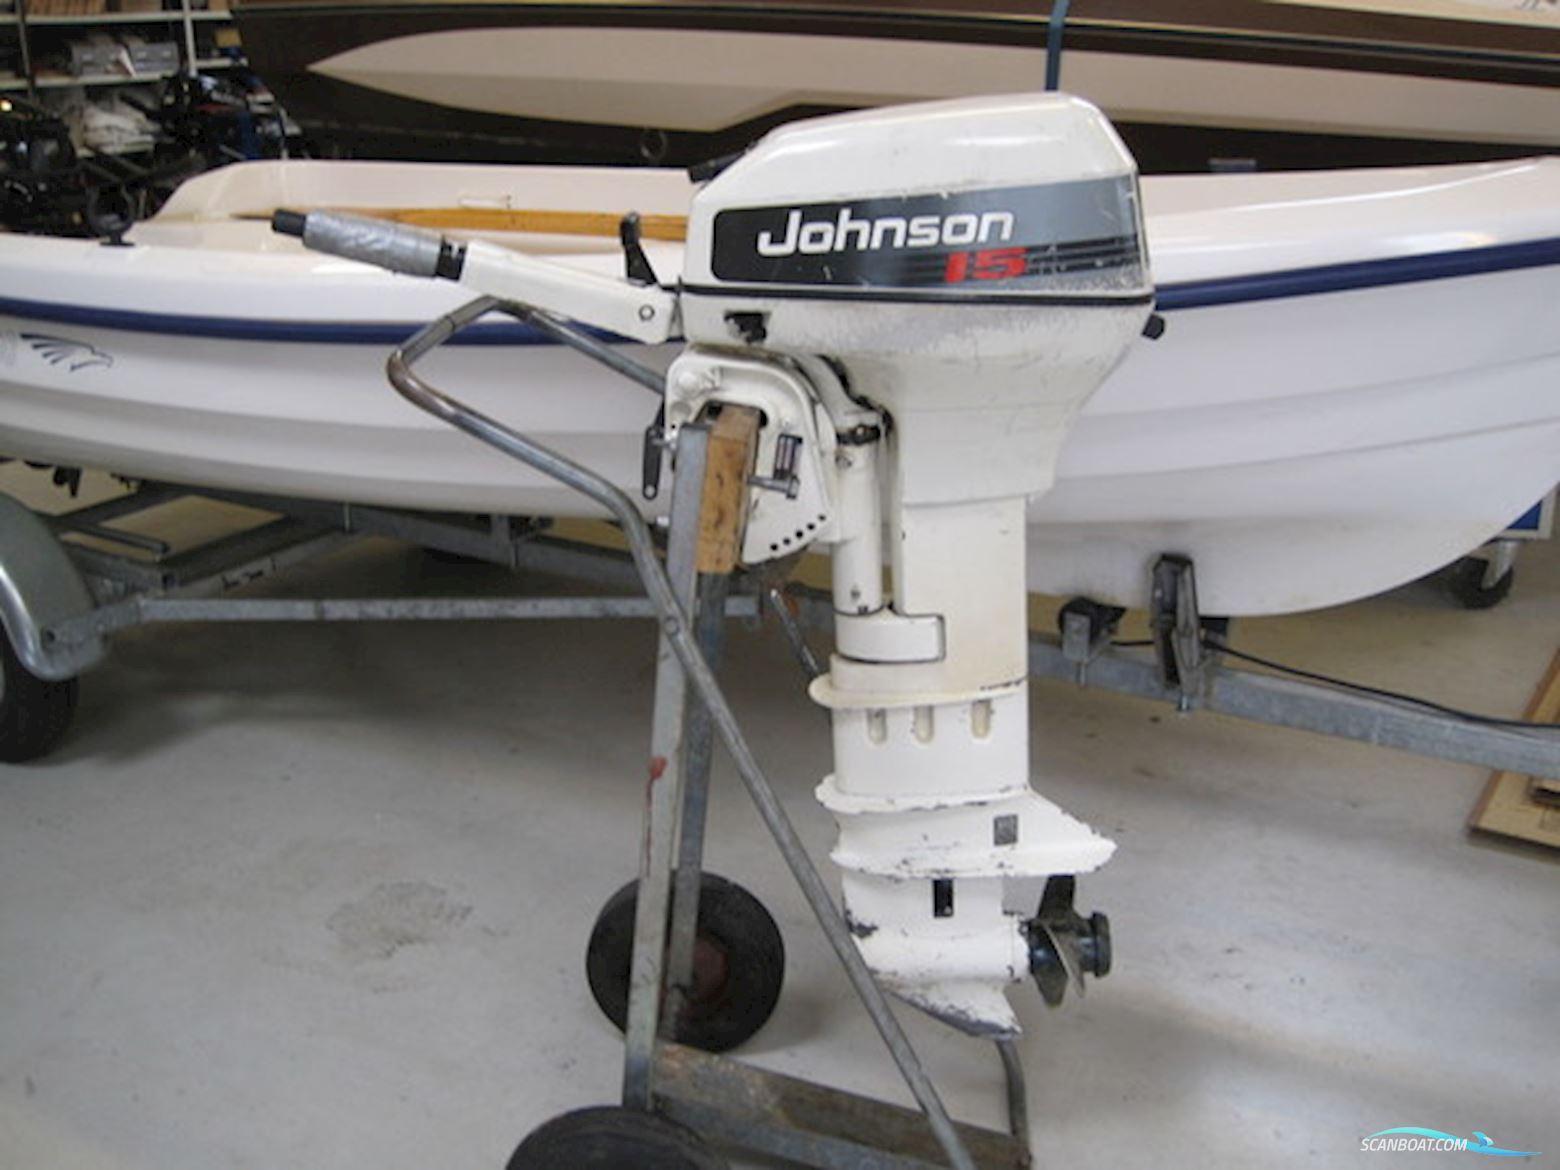 Johnson BJ 15